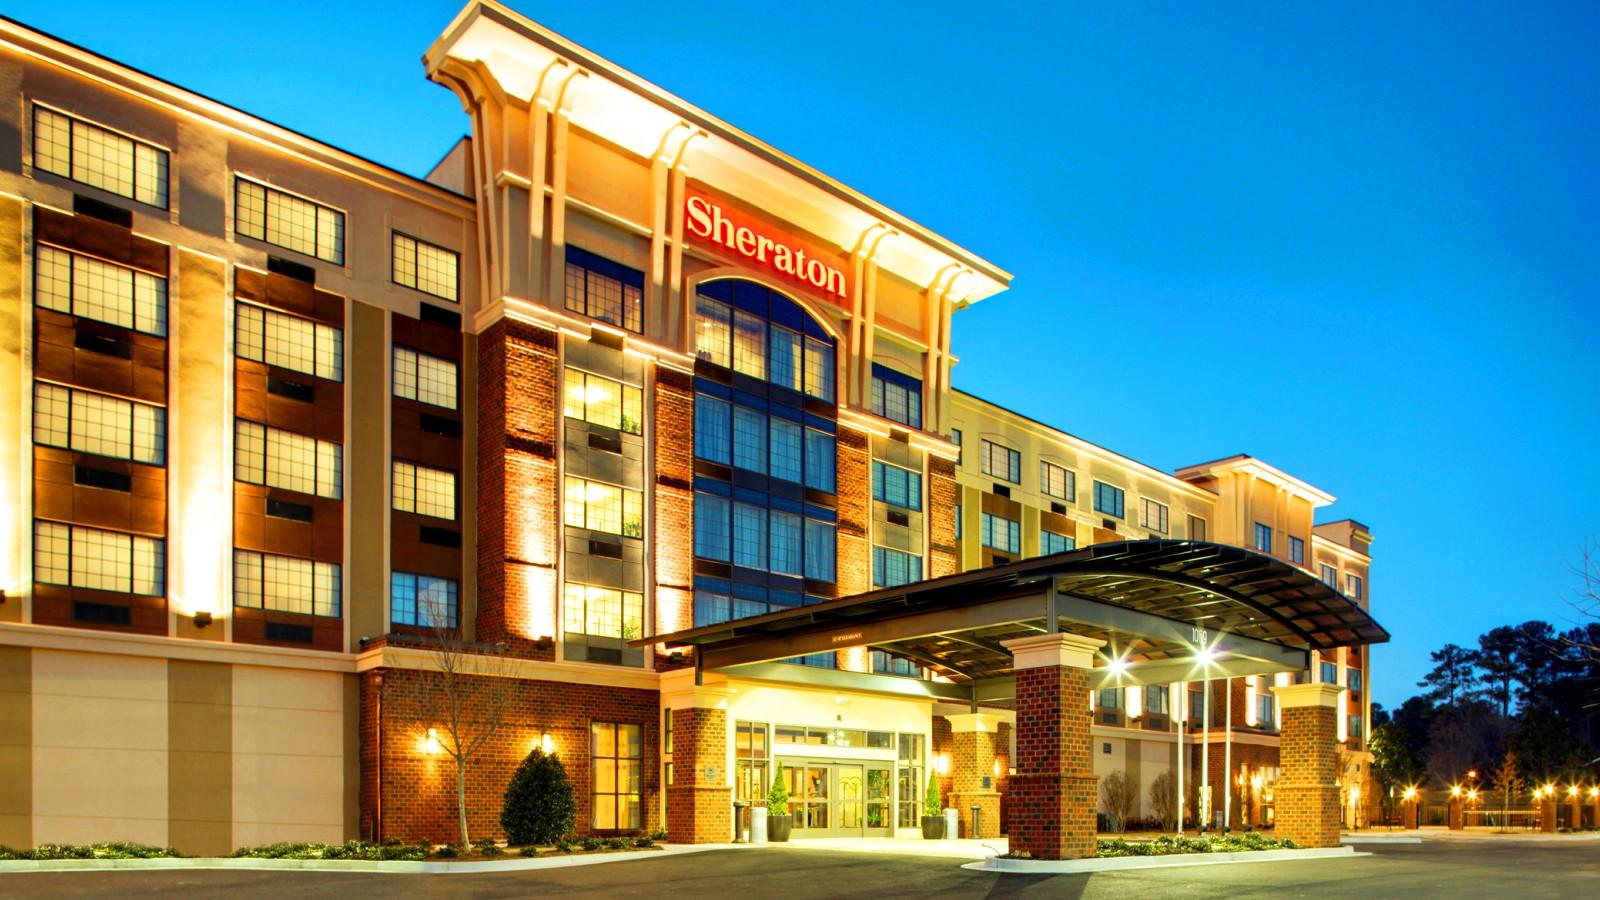 The Sheraton Augusta Hotel